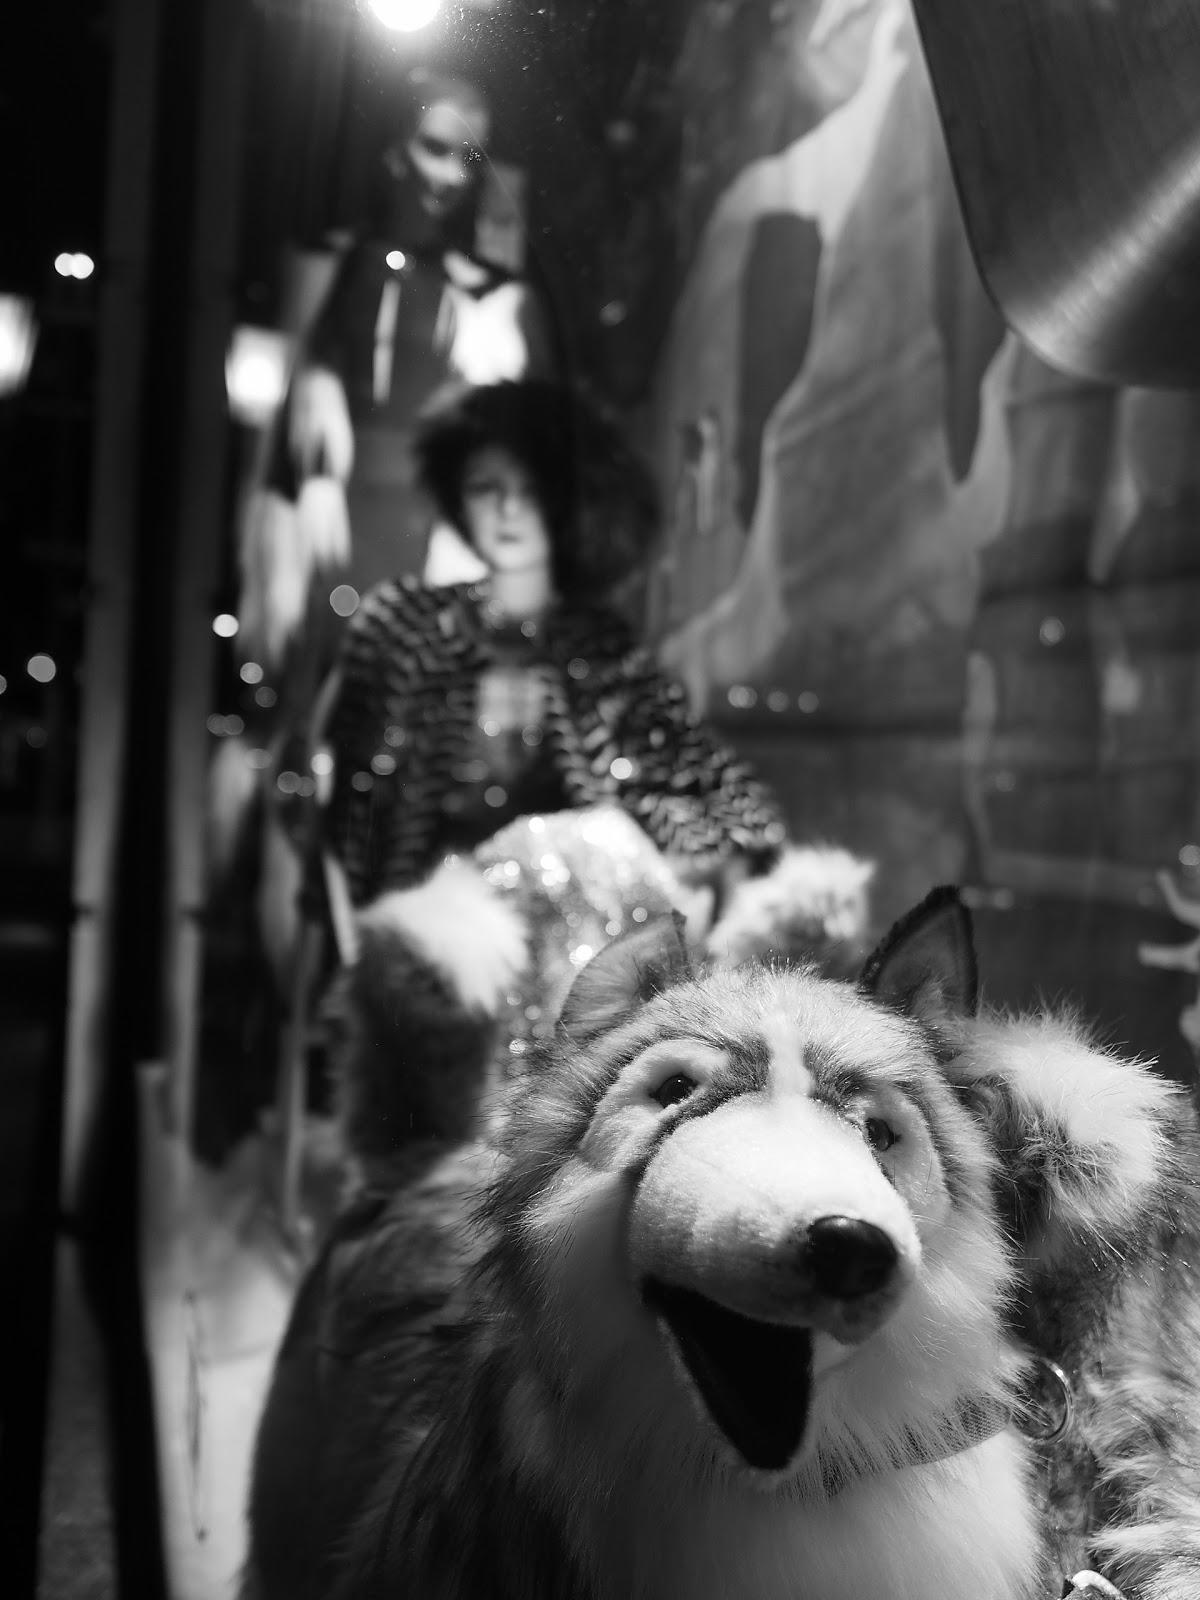 Plush #Plush #bgwindows #windowwatchers #holidaywindows #5thavenuewindows #NYC  #holidays #besttimeoftheyear #nyc ©2014 Nancy Lundebjerg